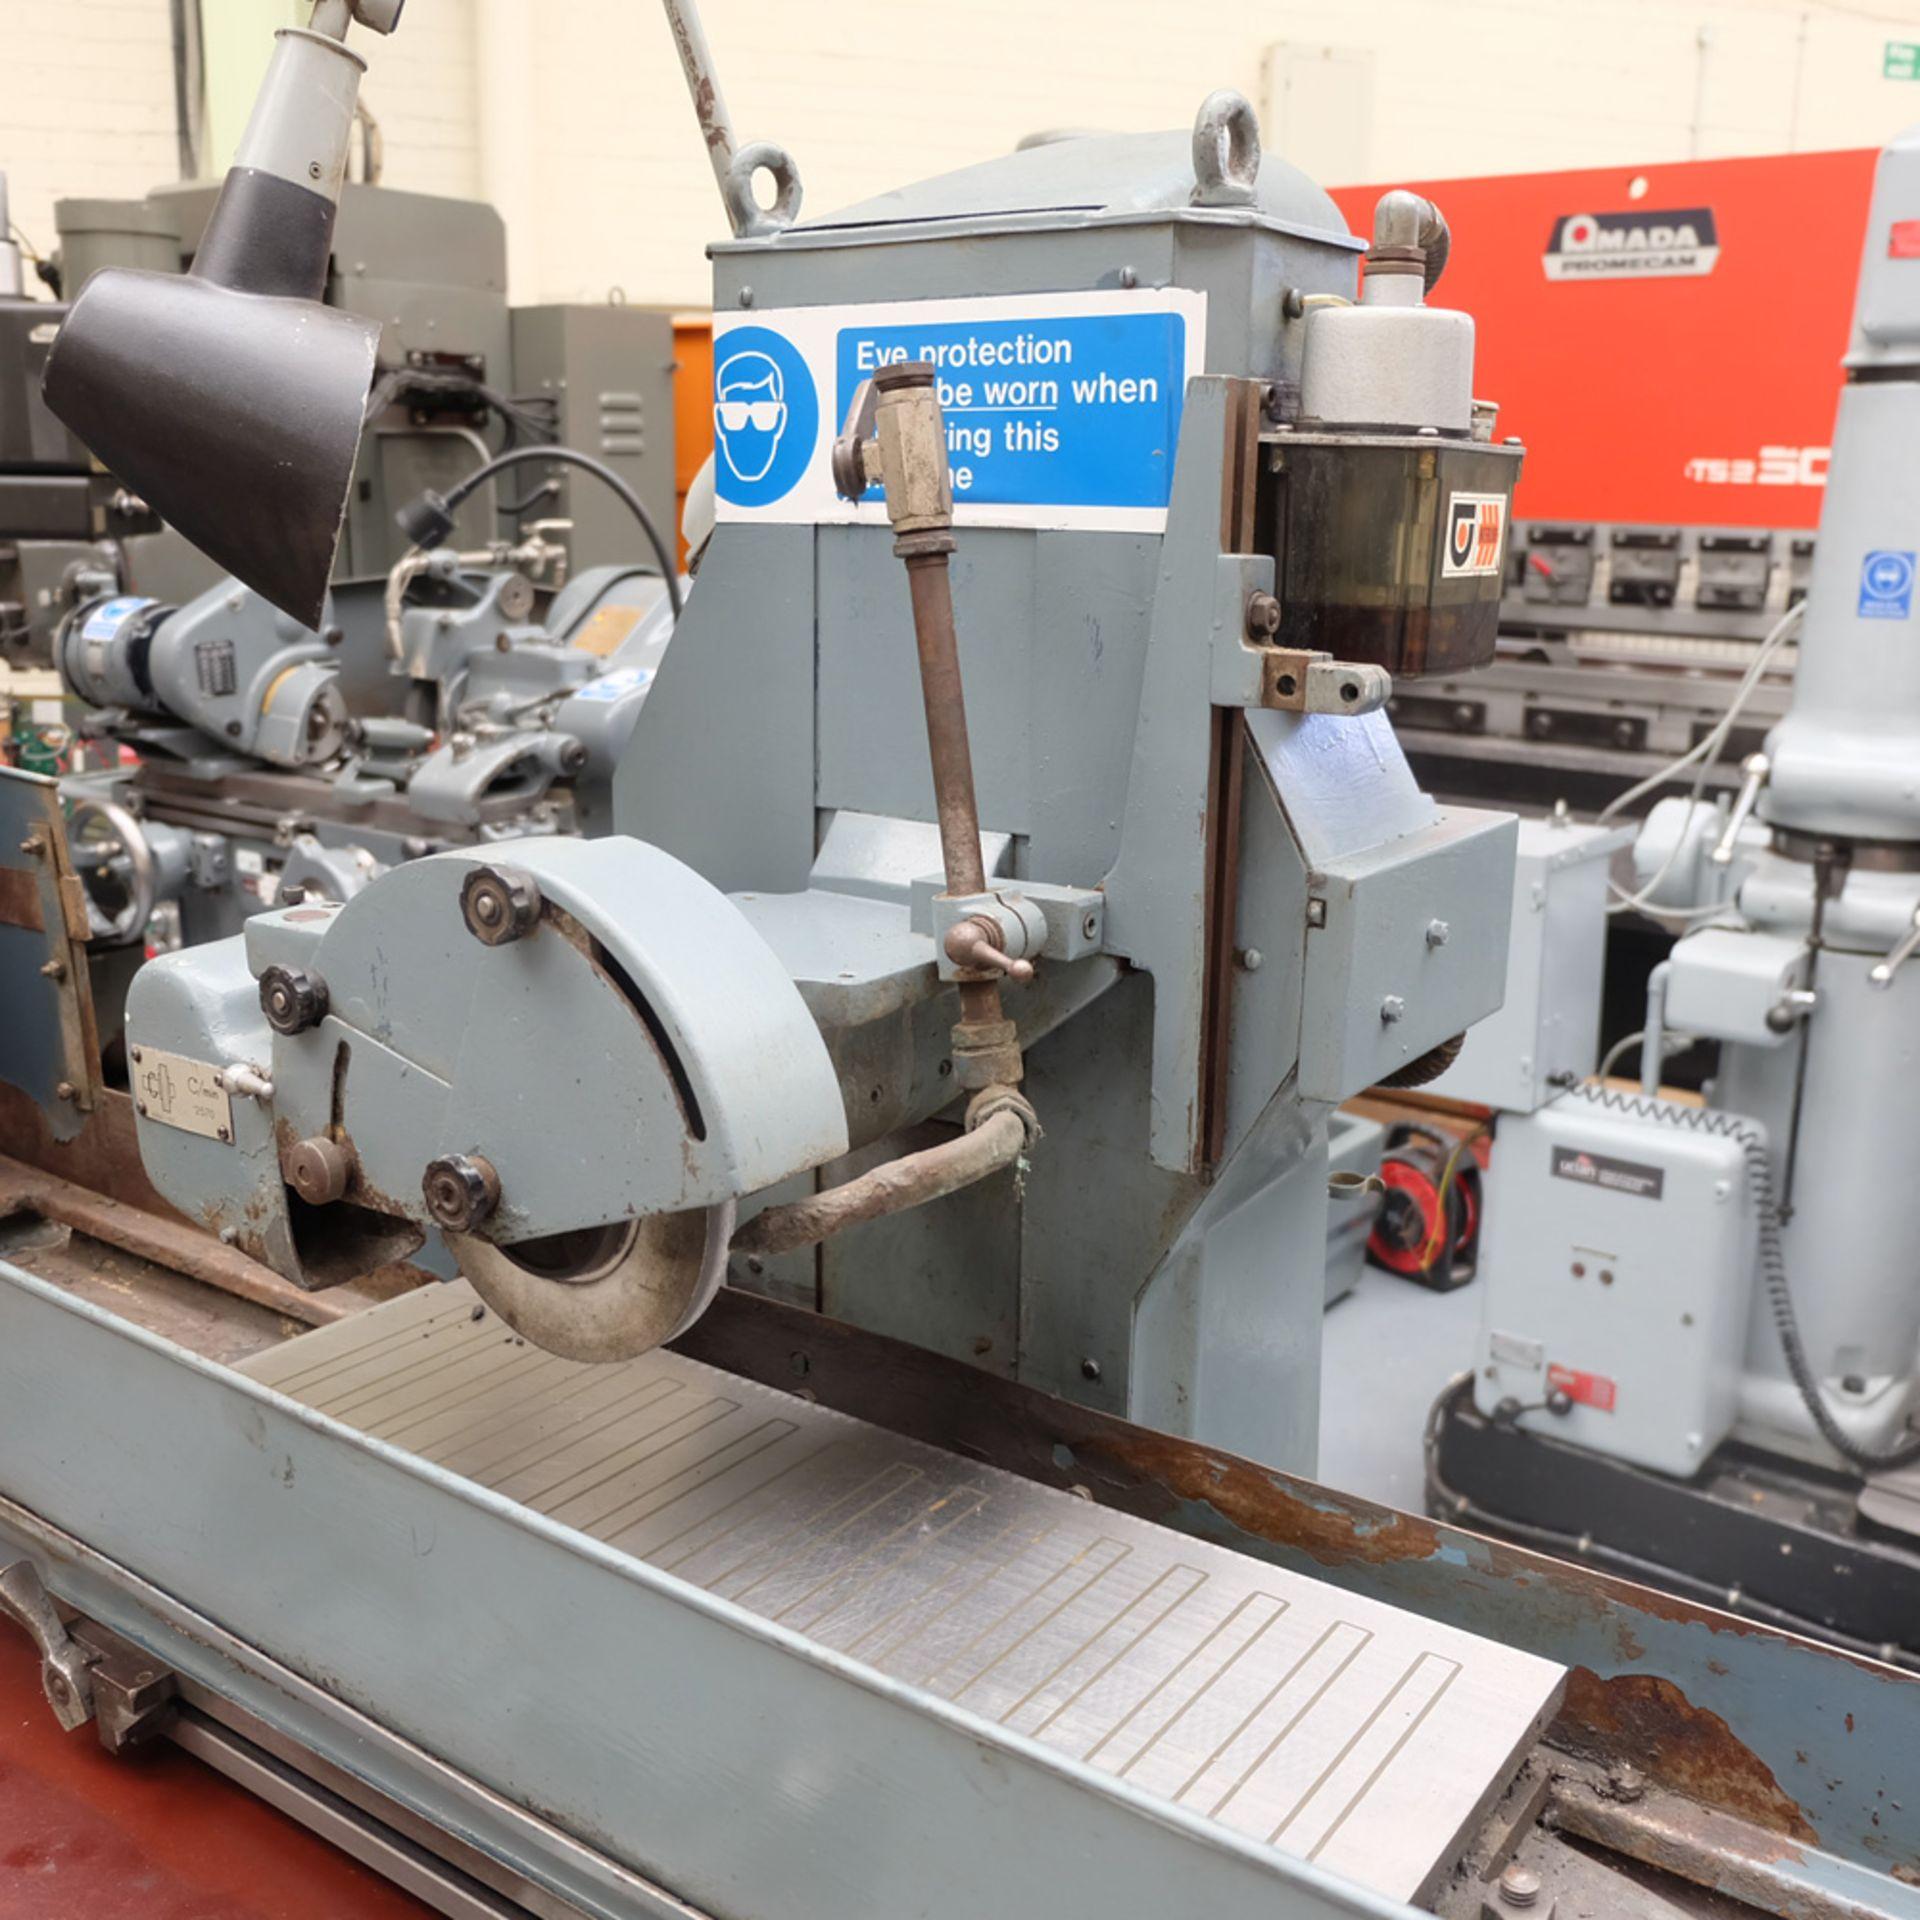 Jones & Shipman 1400P Toolroom Surface Grinder. - Image 2 of 10